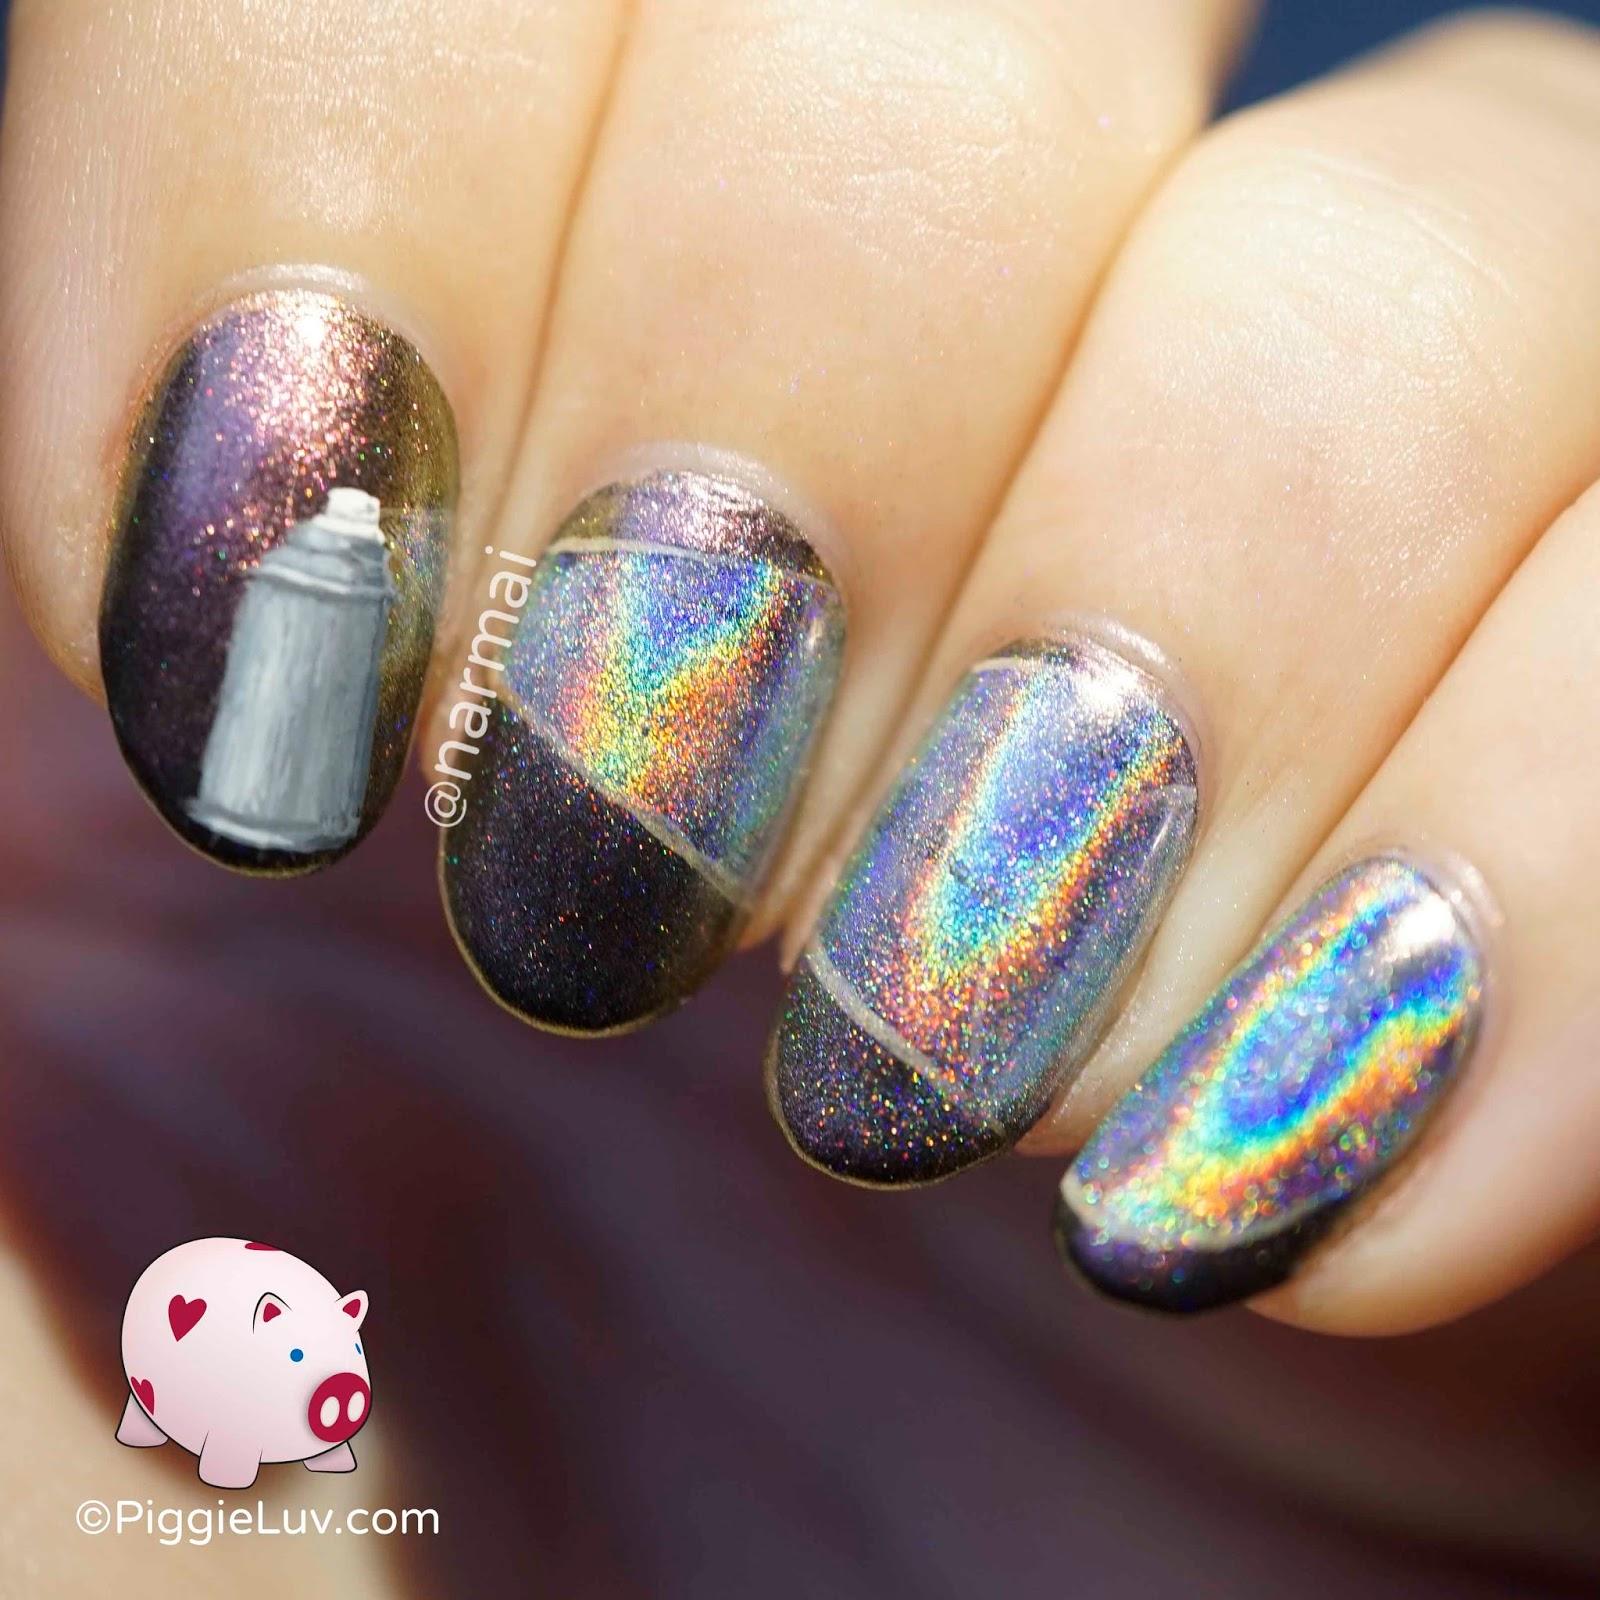 PiggieLuv: Holo spray paint nail art